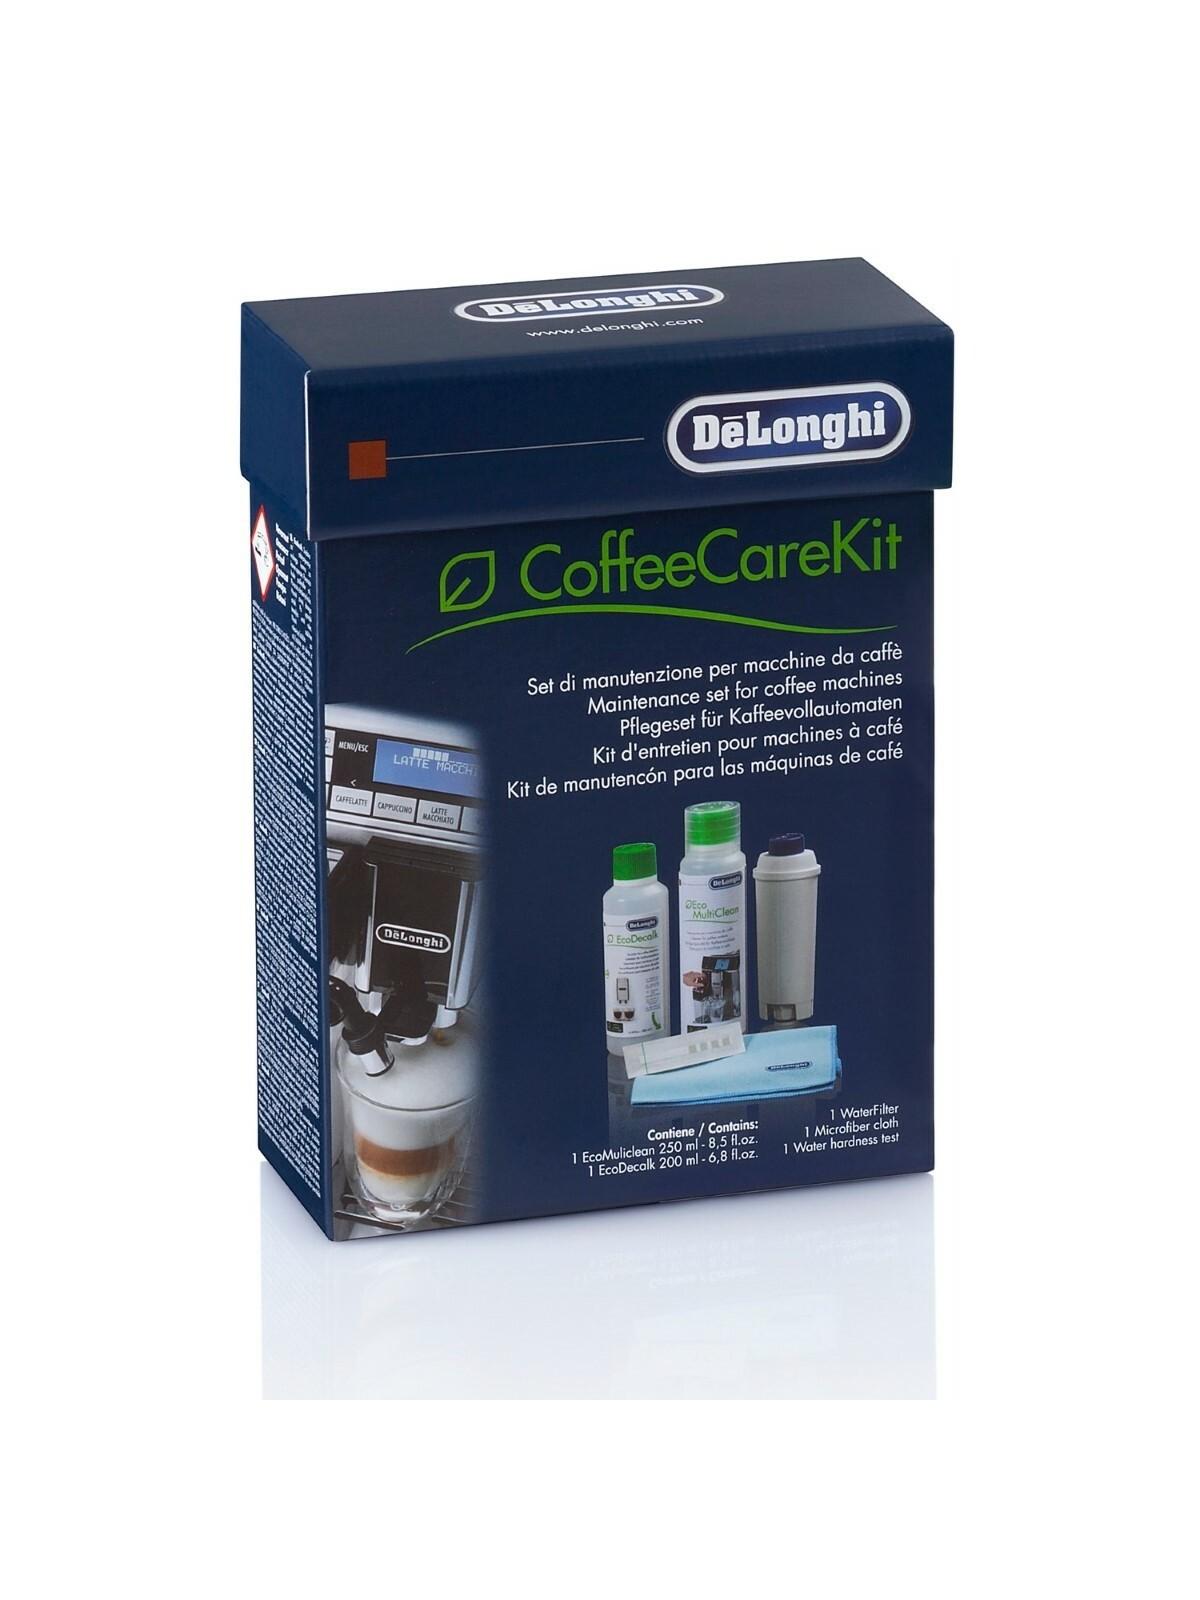 DELONGHI Coffee Care Kit